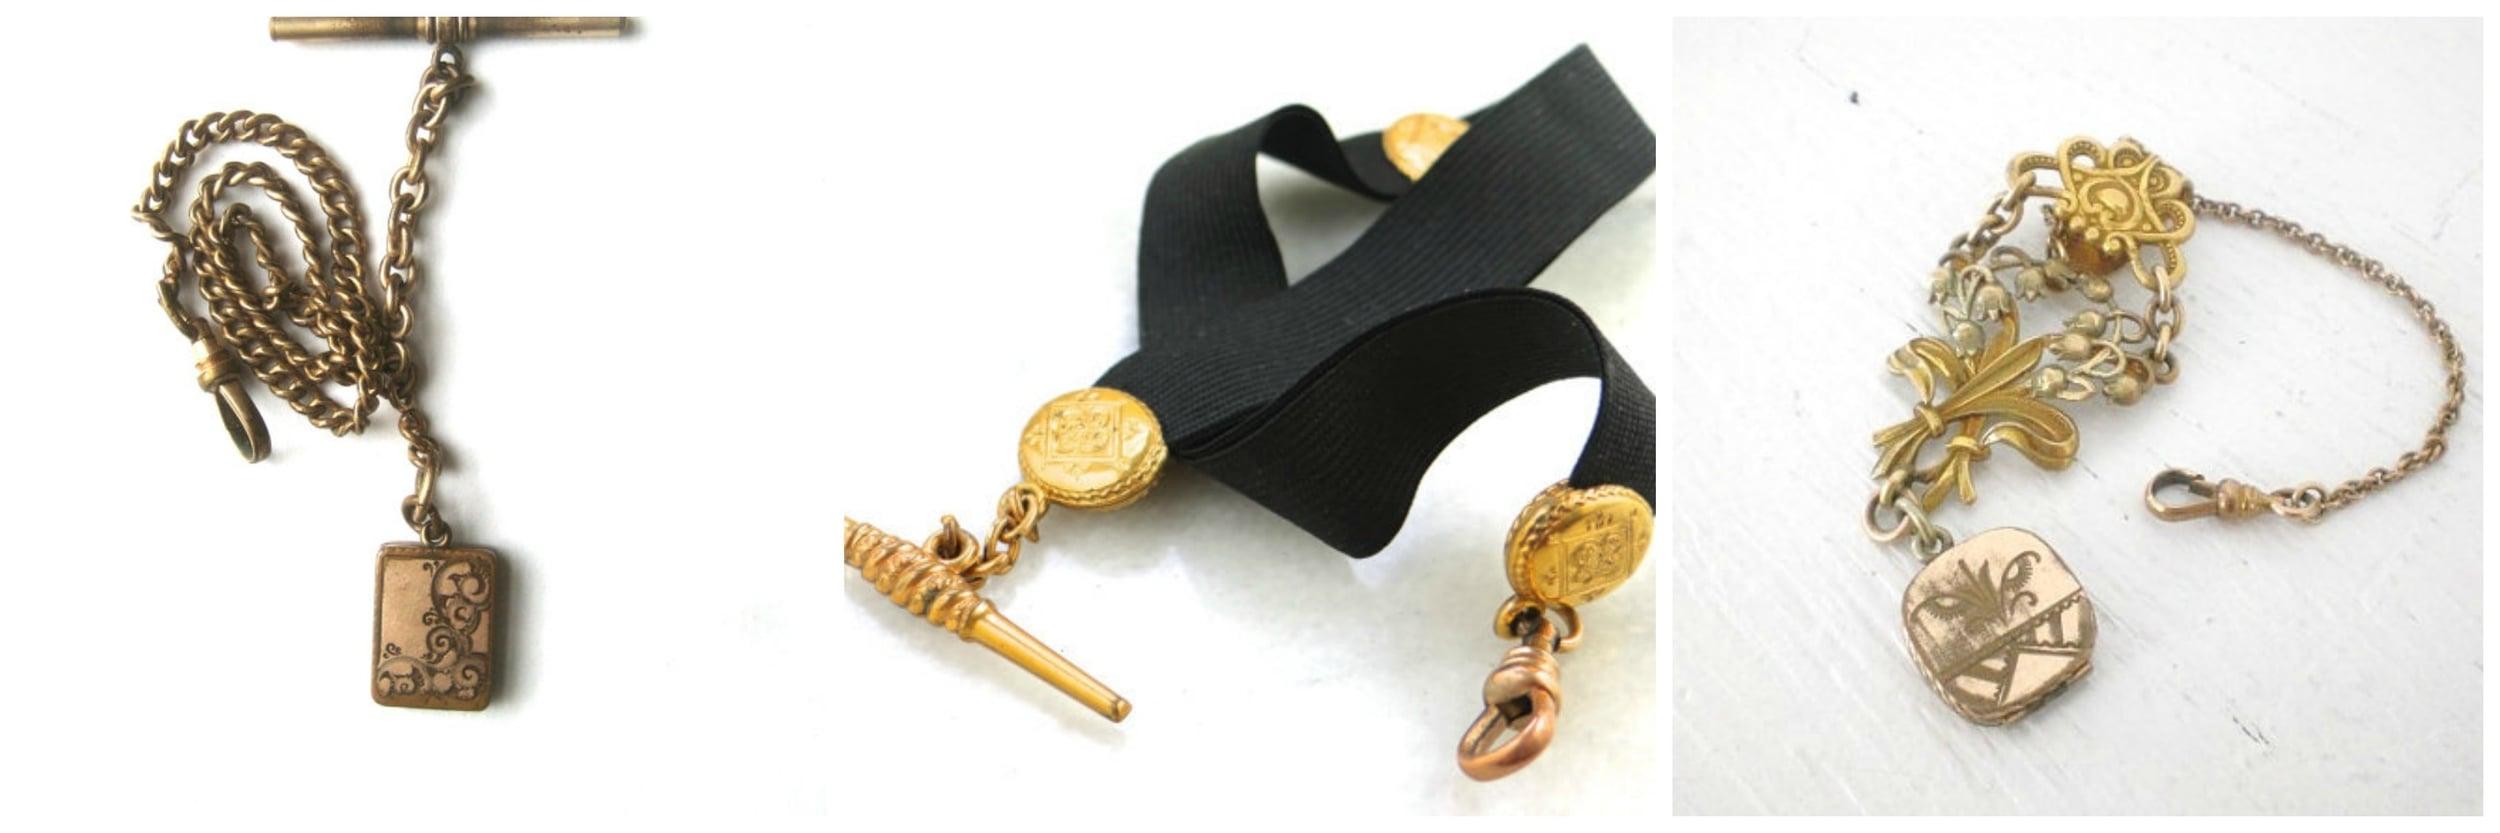 Antique Locket Pocket Watch Chain via  BetterWythAge  - Victorian Mourning Ribbon Pocket Watch via  MSJewelers  - Vintage Watch Chain Fob via  GallivantsVintage